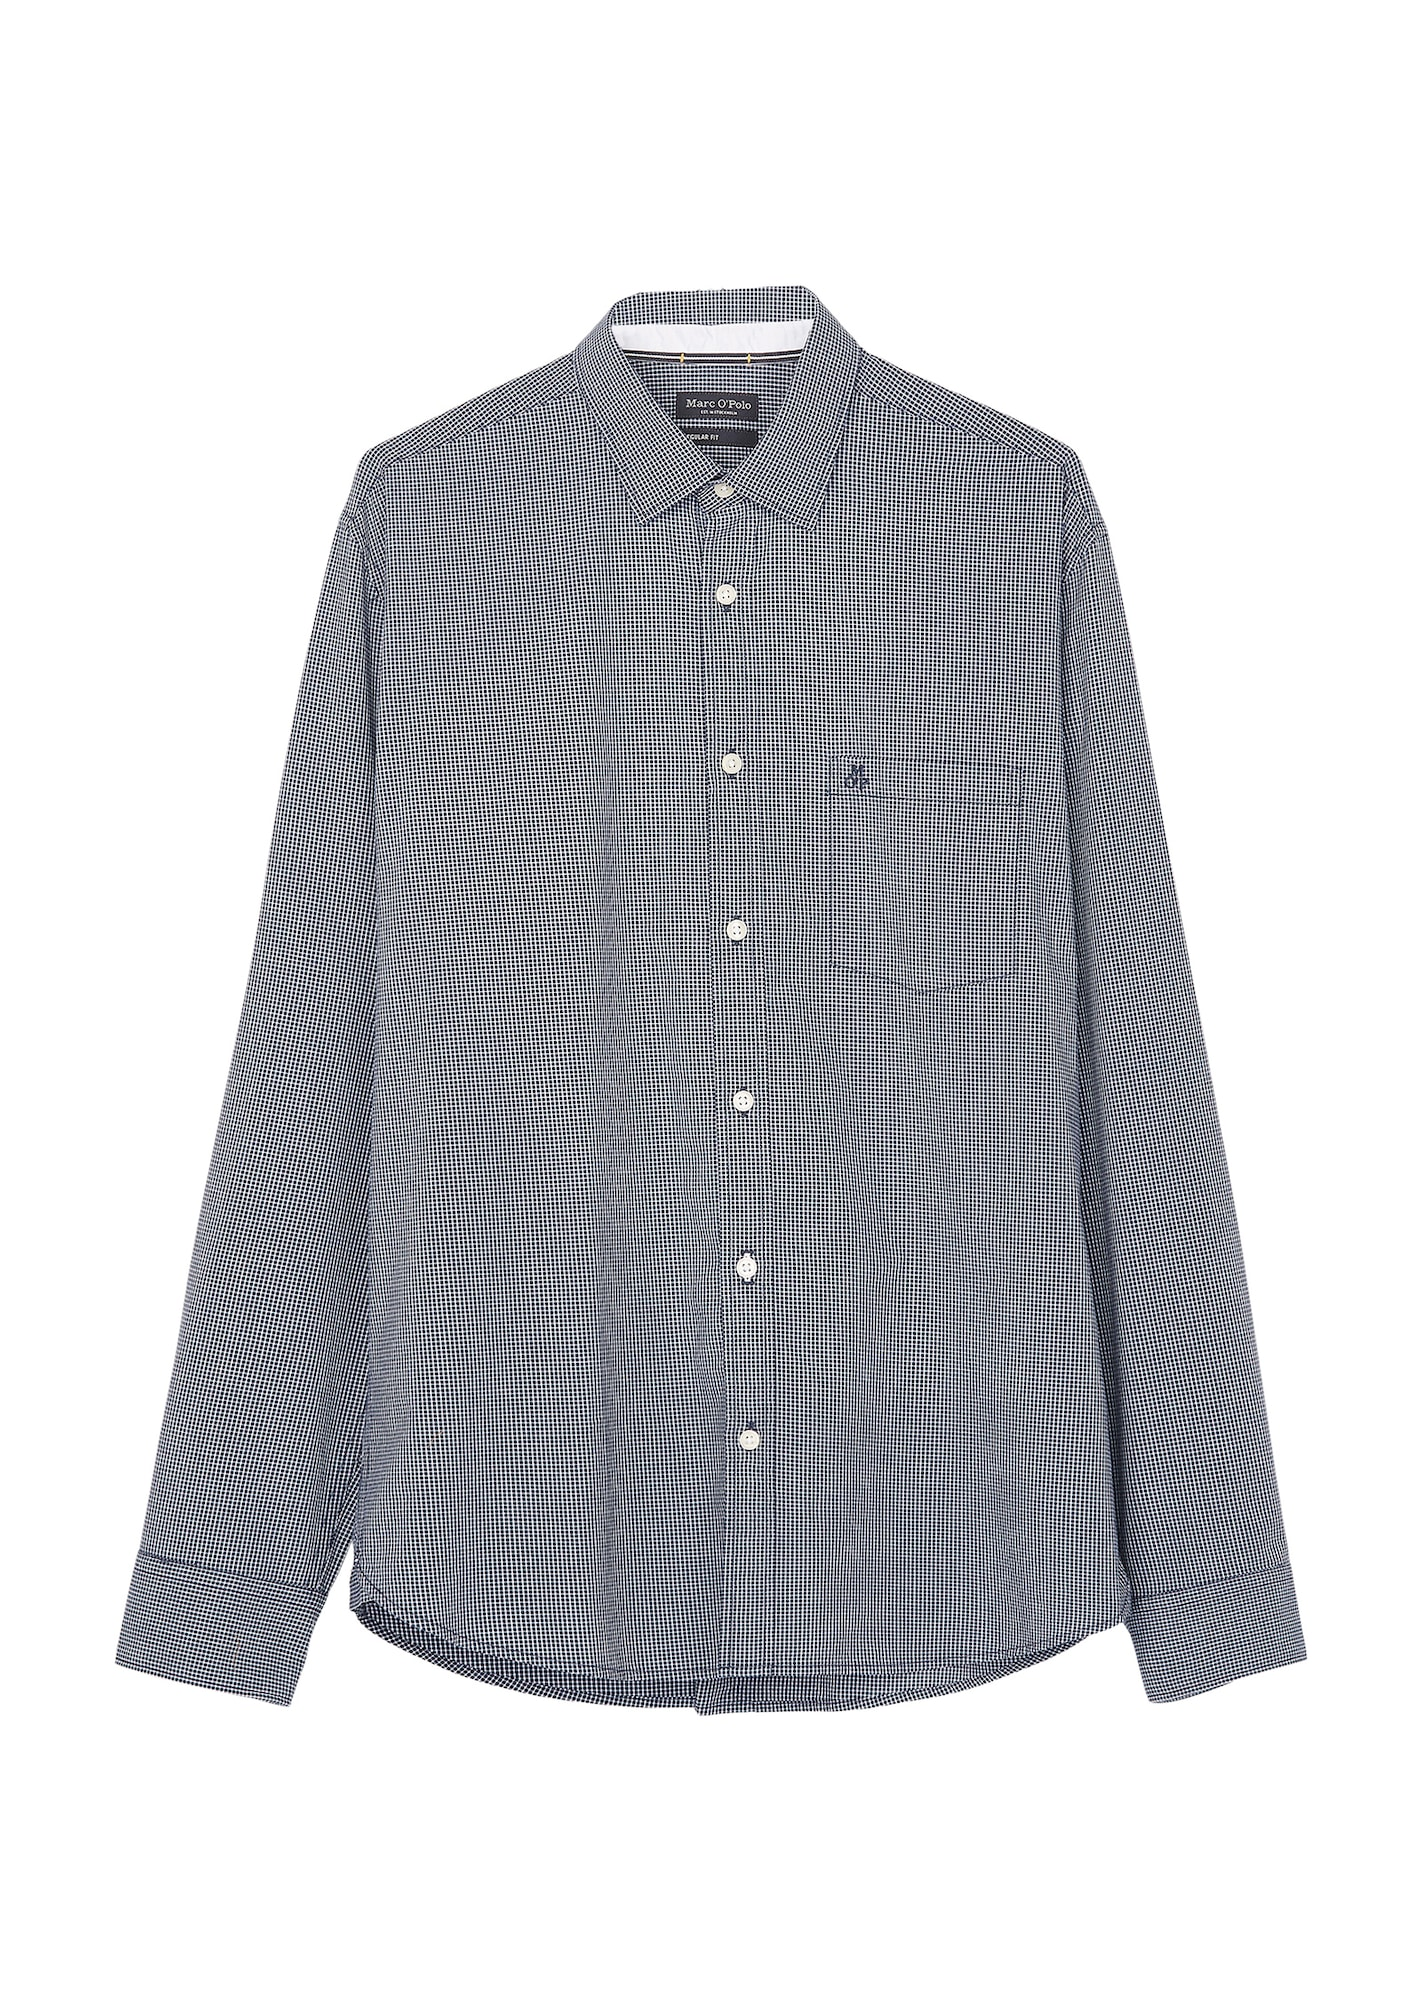 Marc O'Polo Košile  námořnická modř / bílá